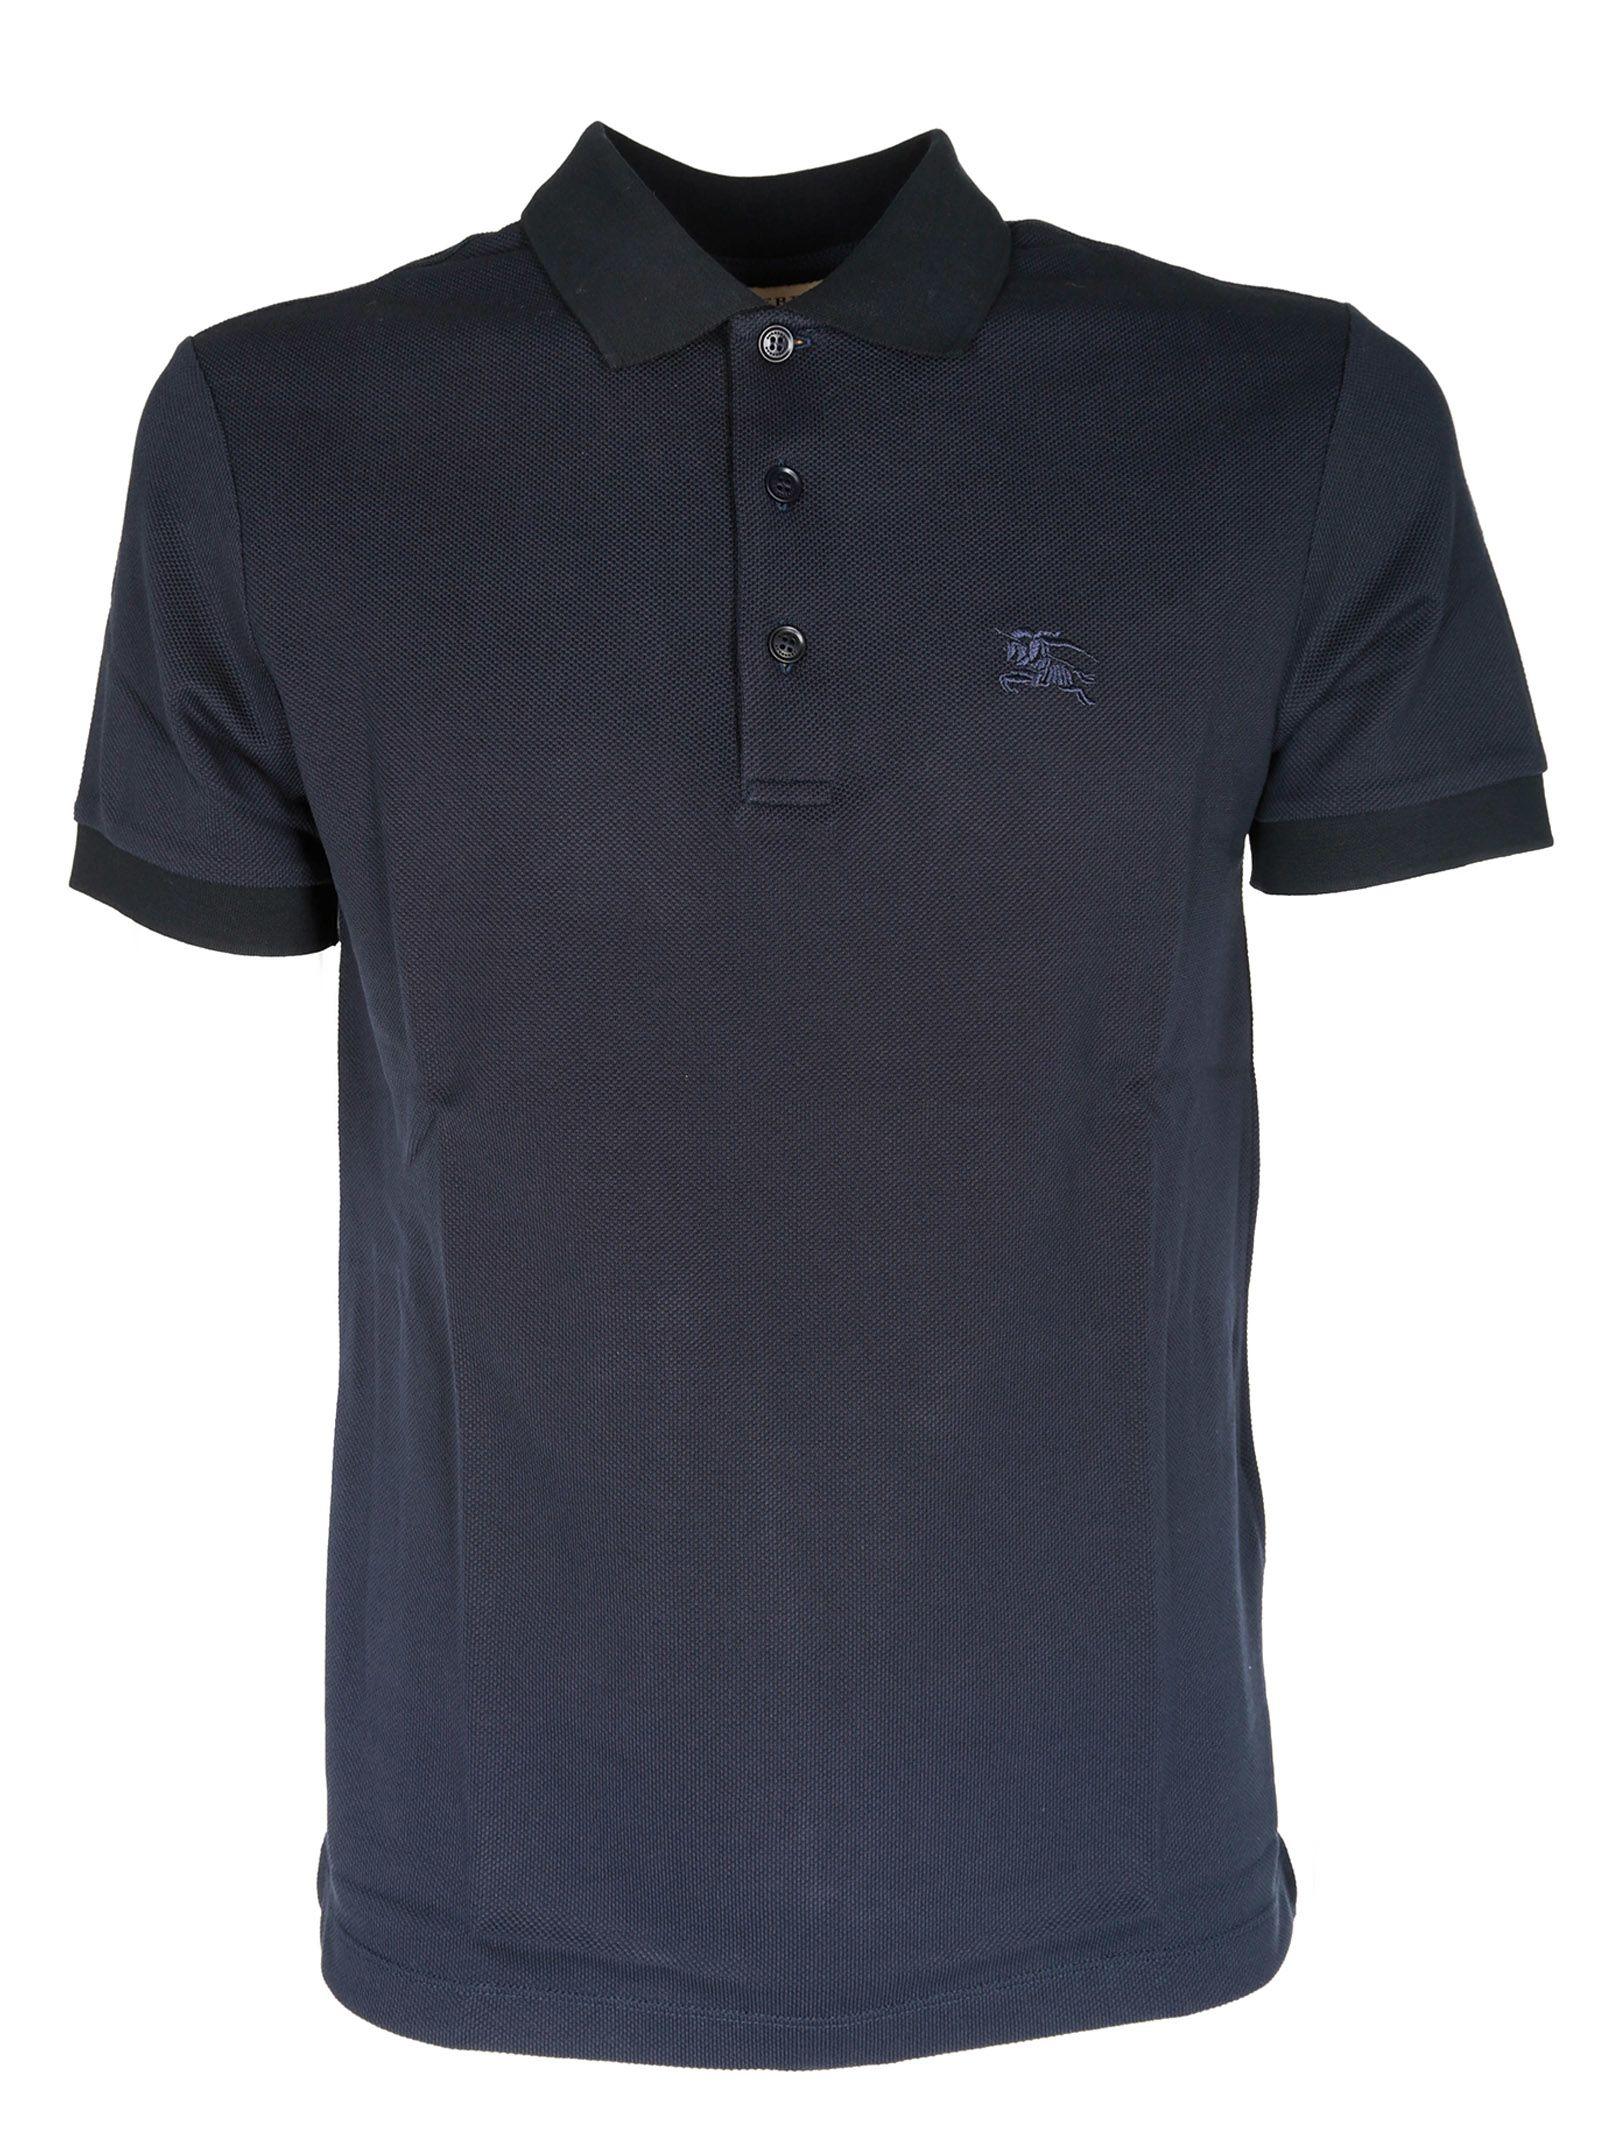 Burberry Burberry Vintage Polo Shirt 10804261 Italist